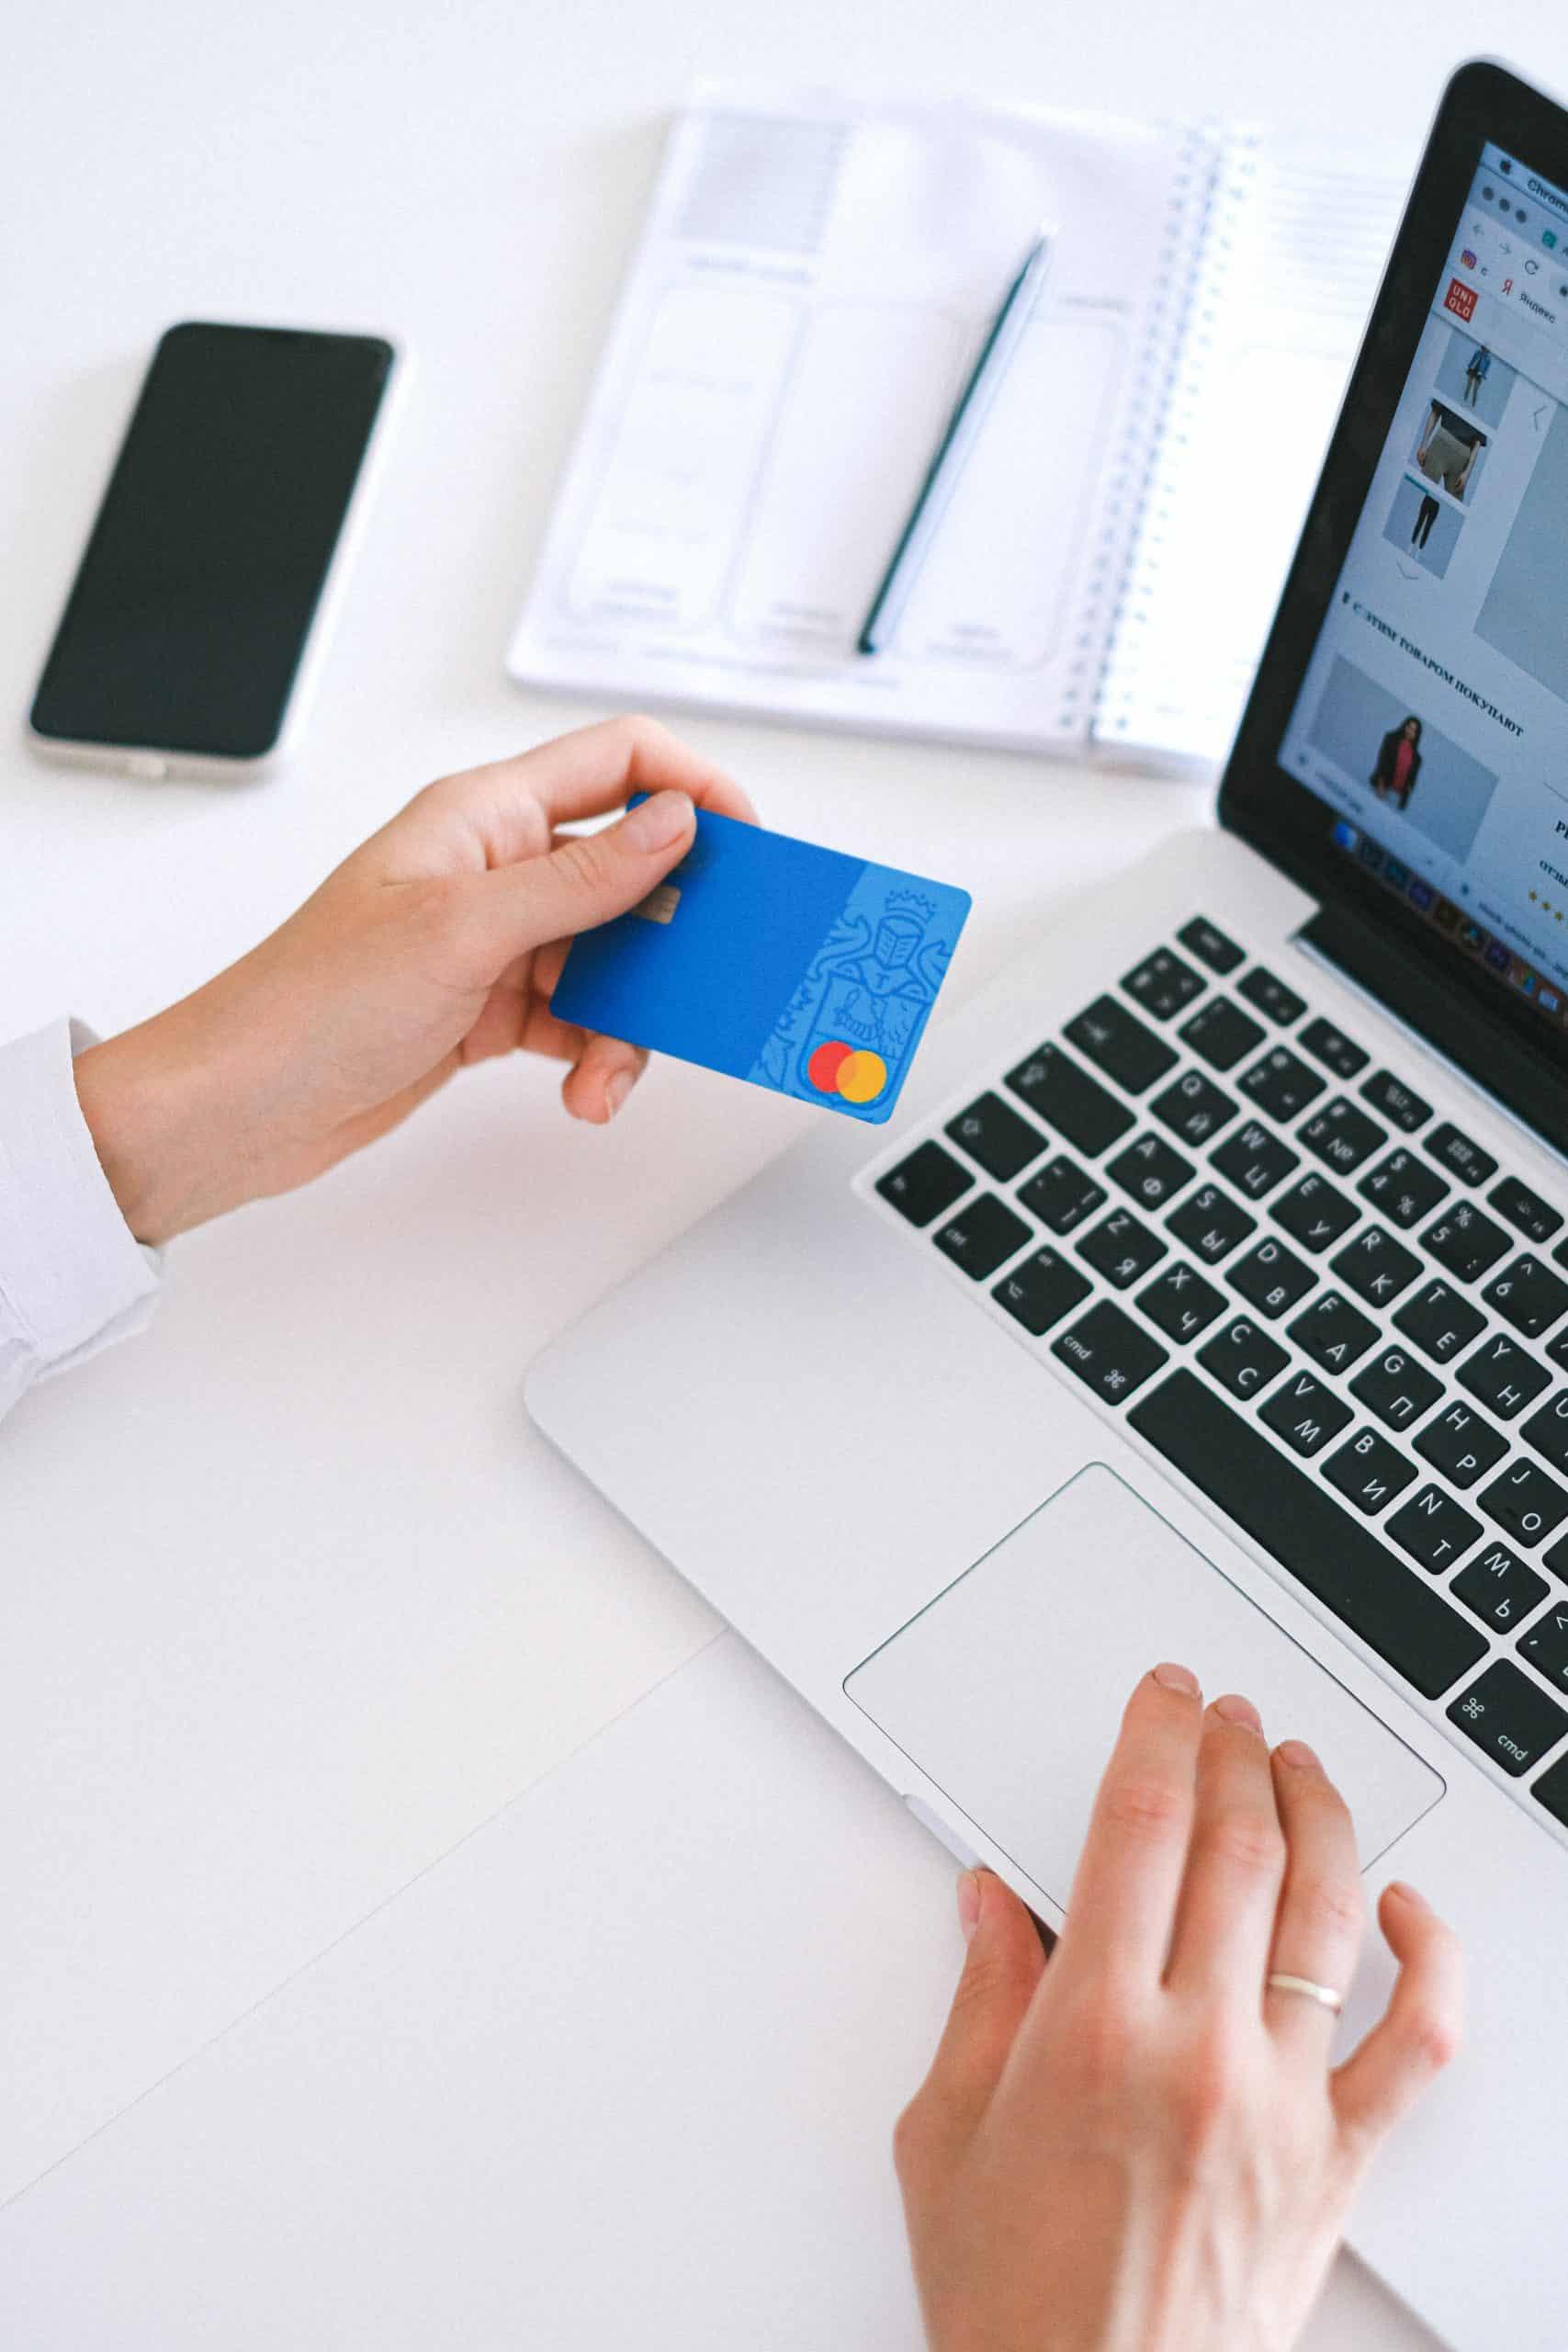 Be safe online when shopping internationally